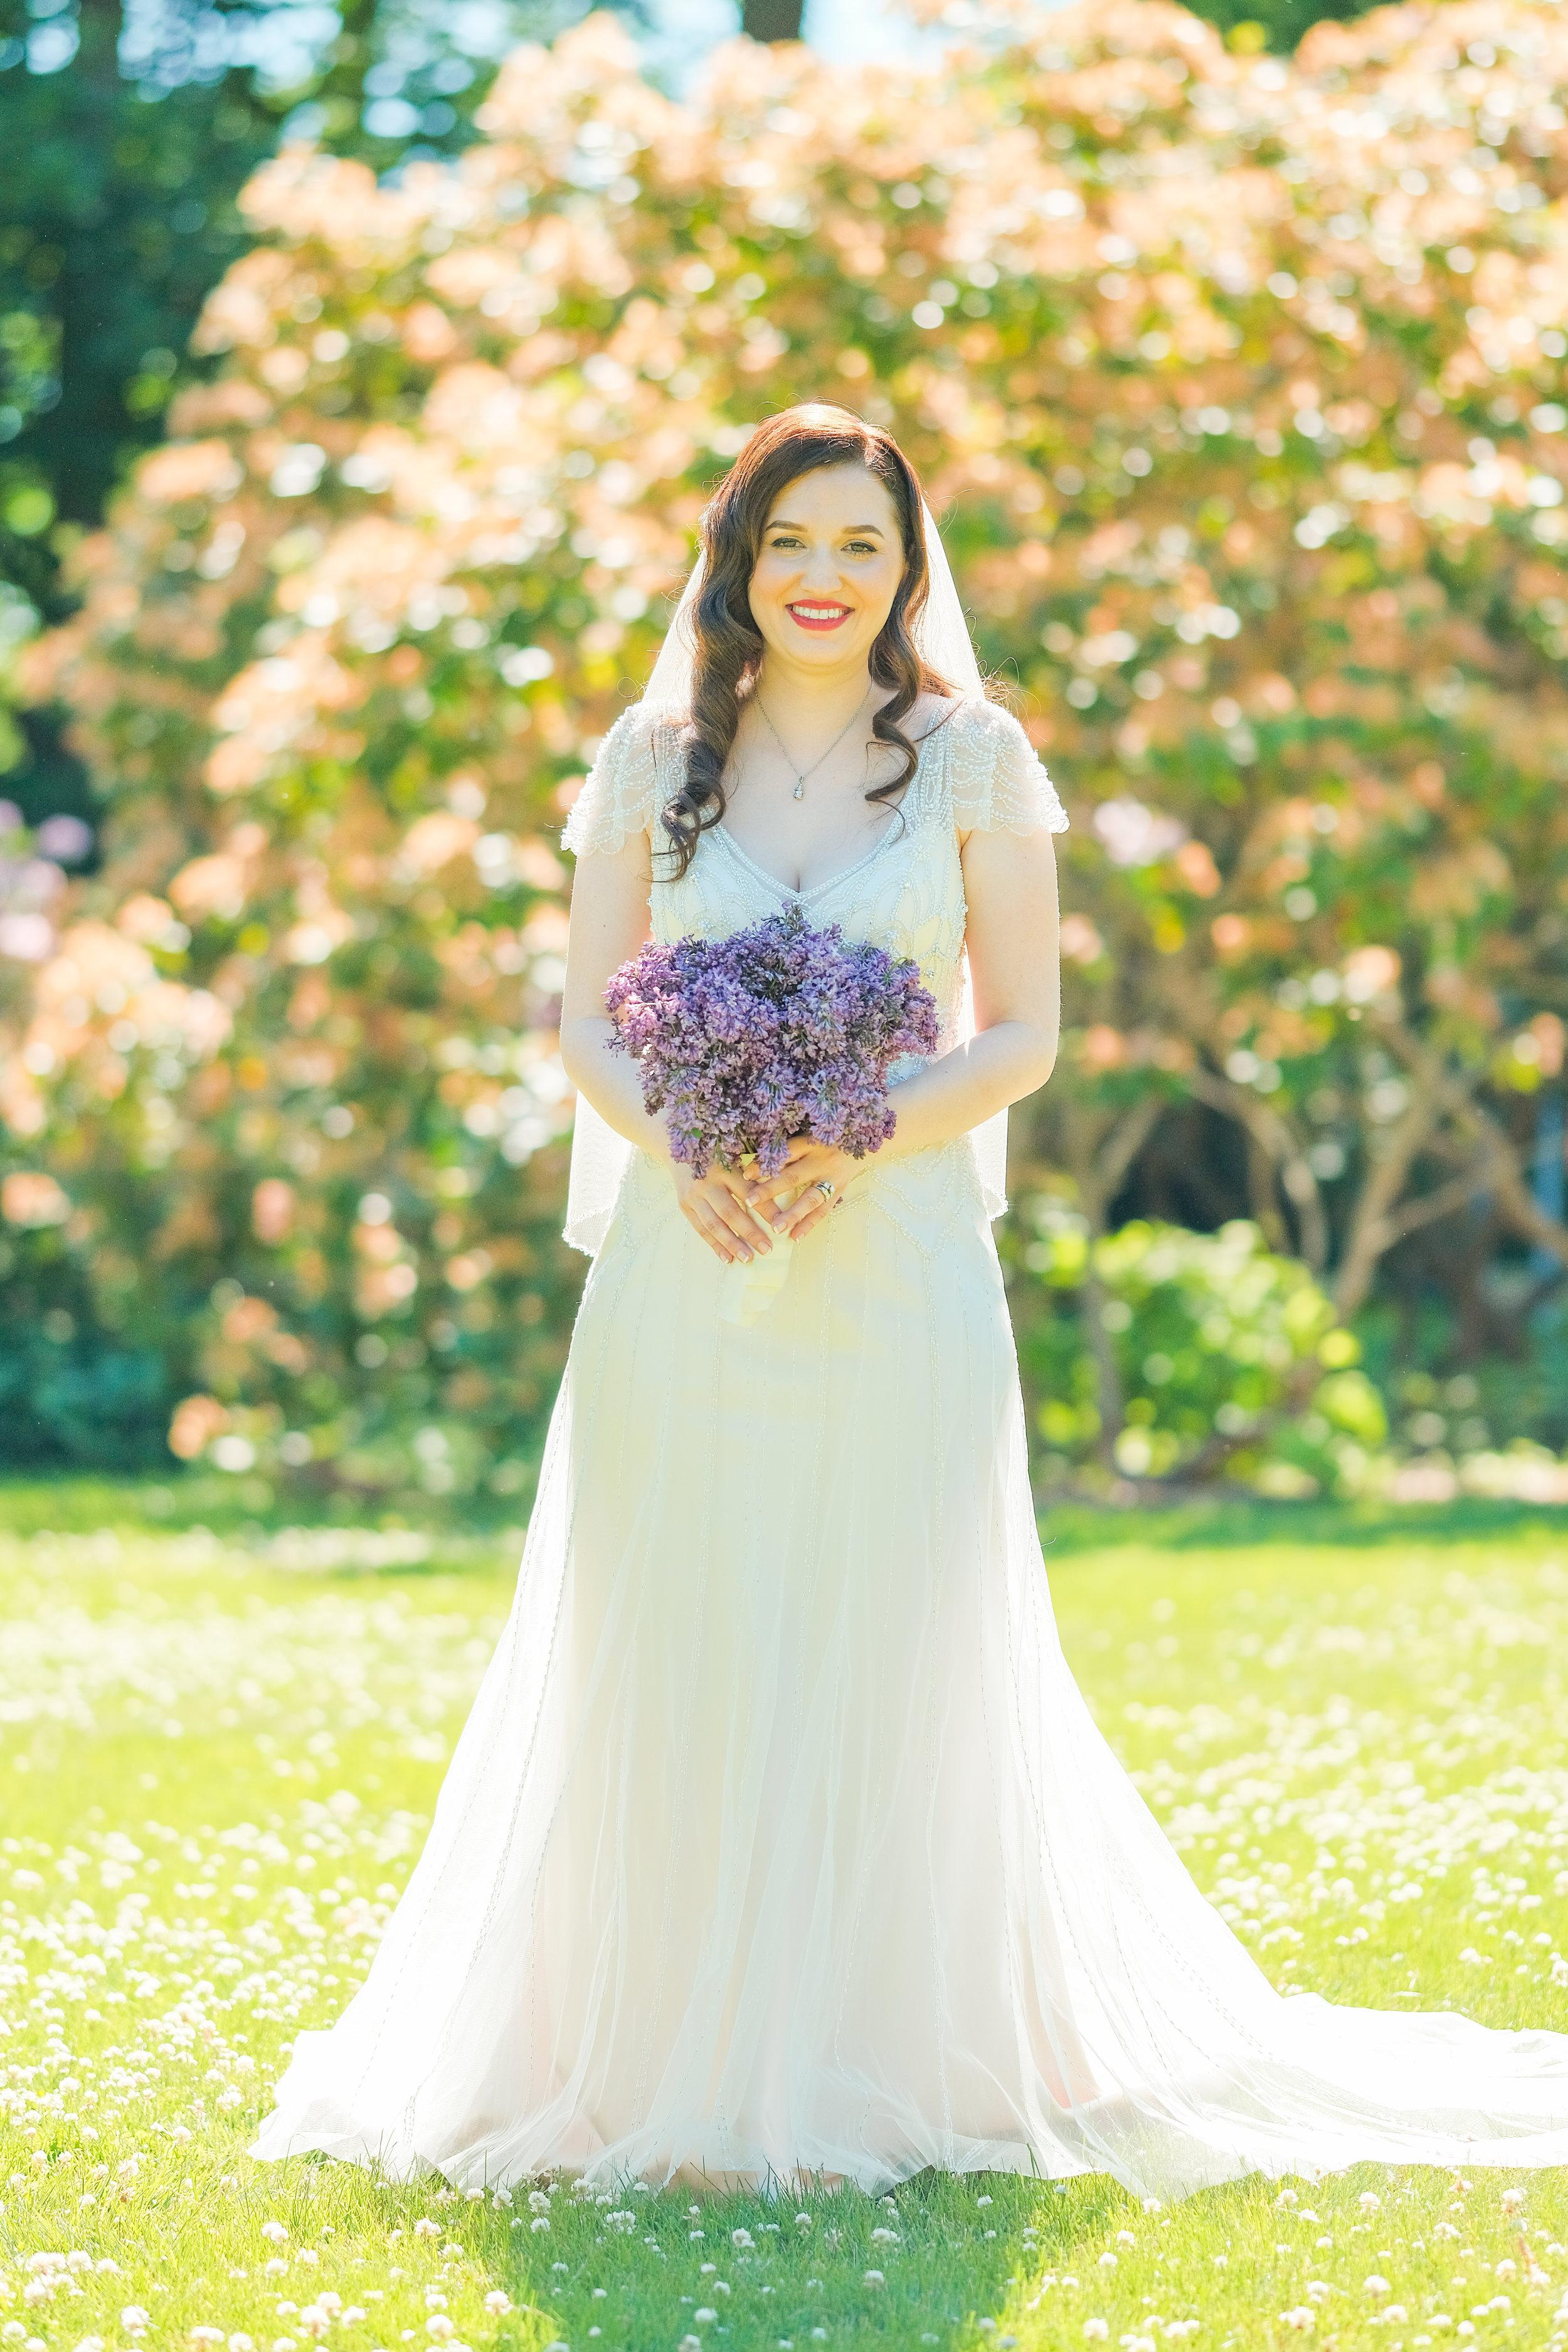 lyman-estate-wedding-photography-46.jpg